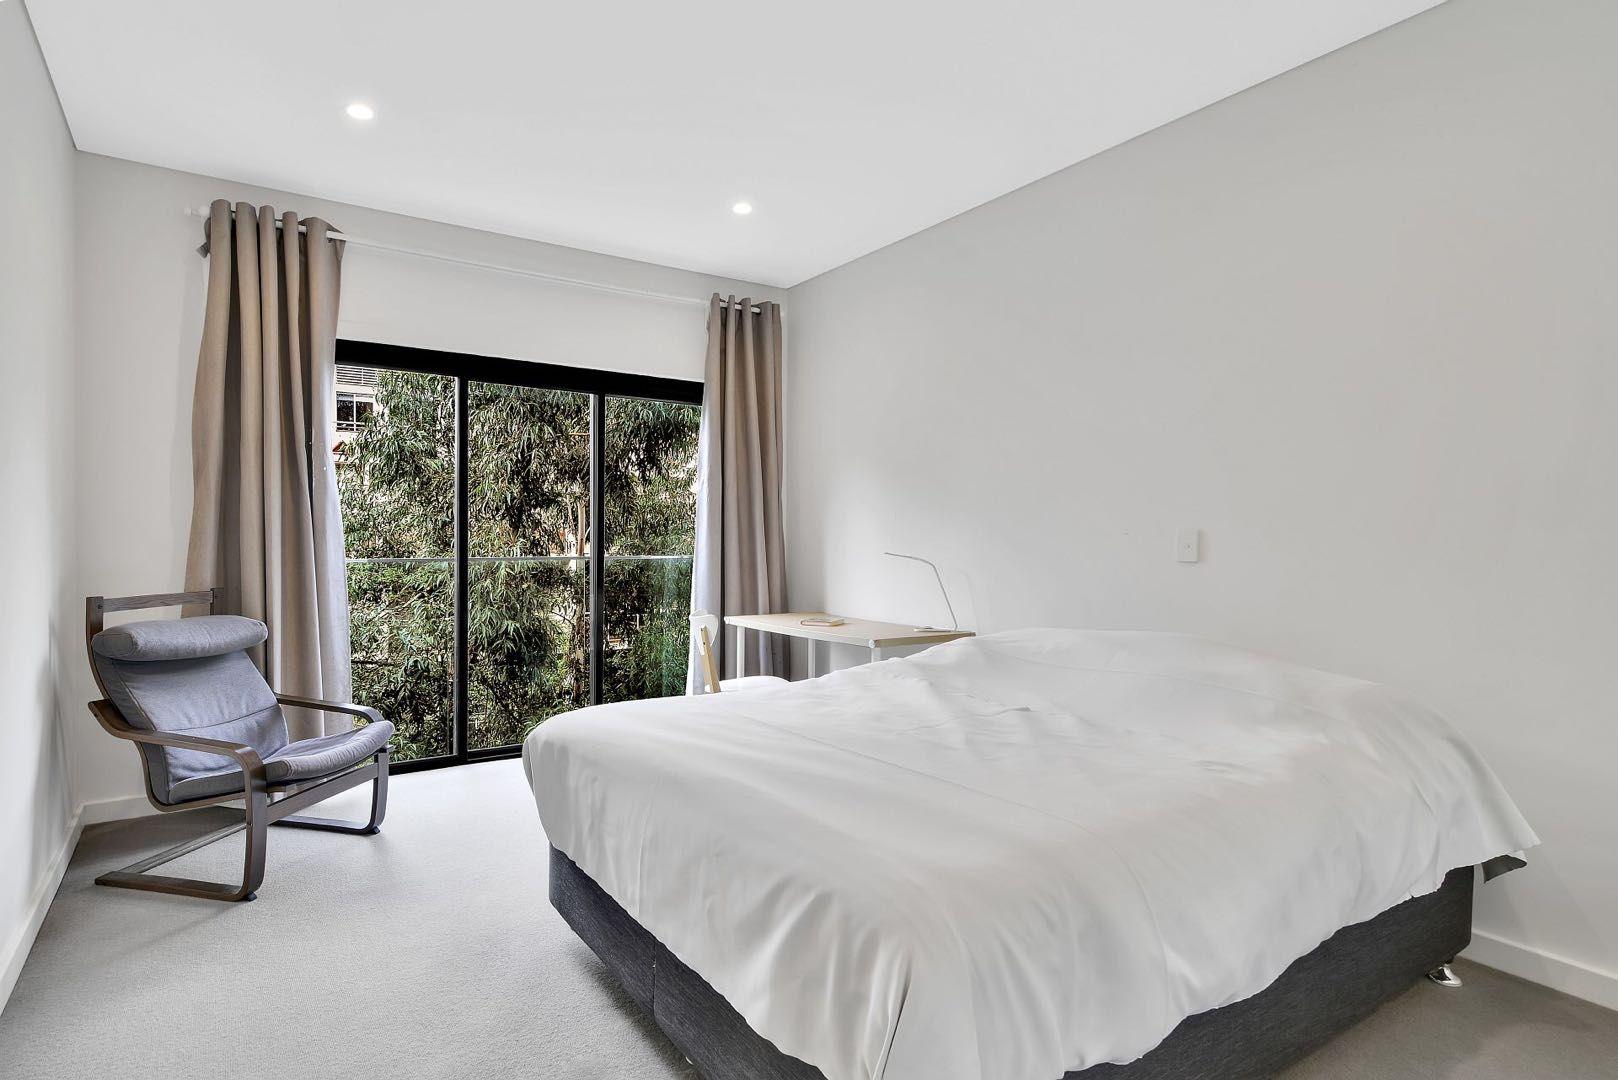 14/42-48 Culworth Ave, Killara NSW 2071, Image 2